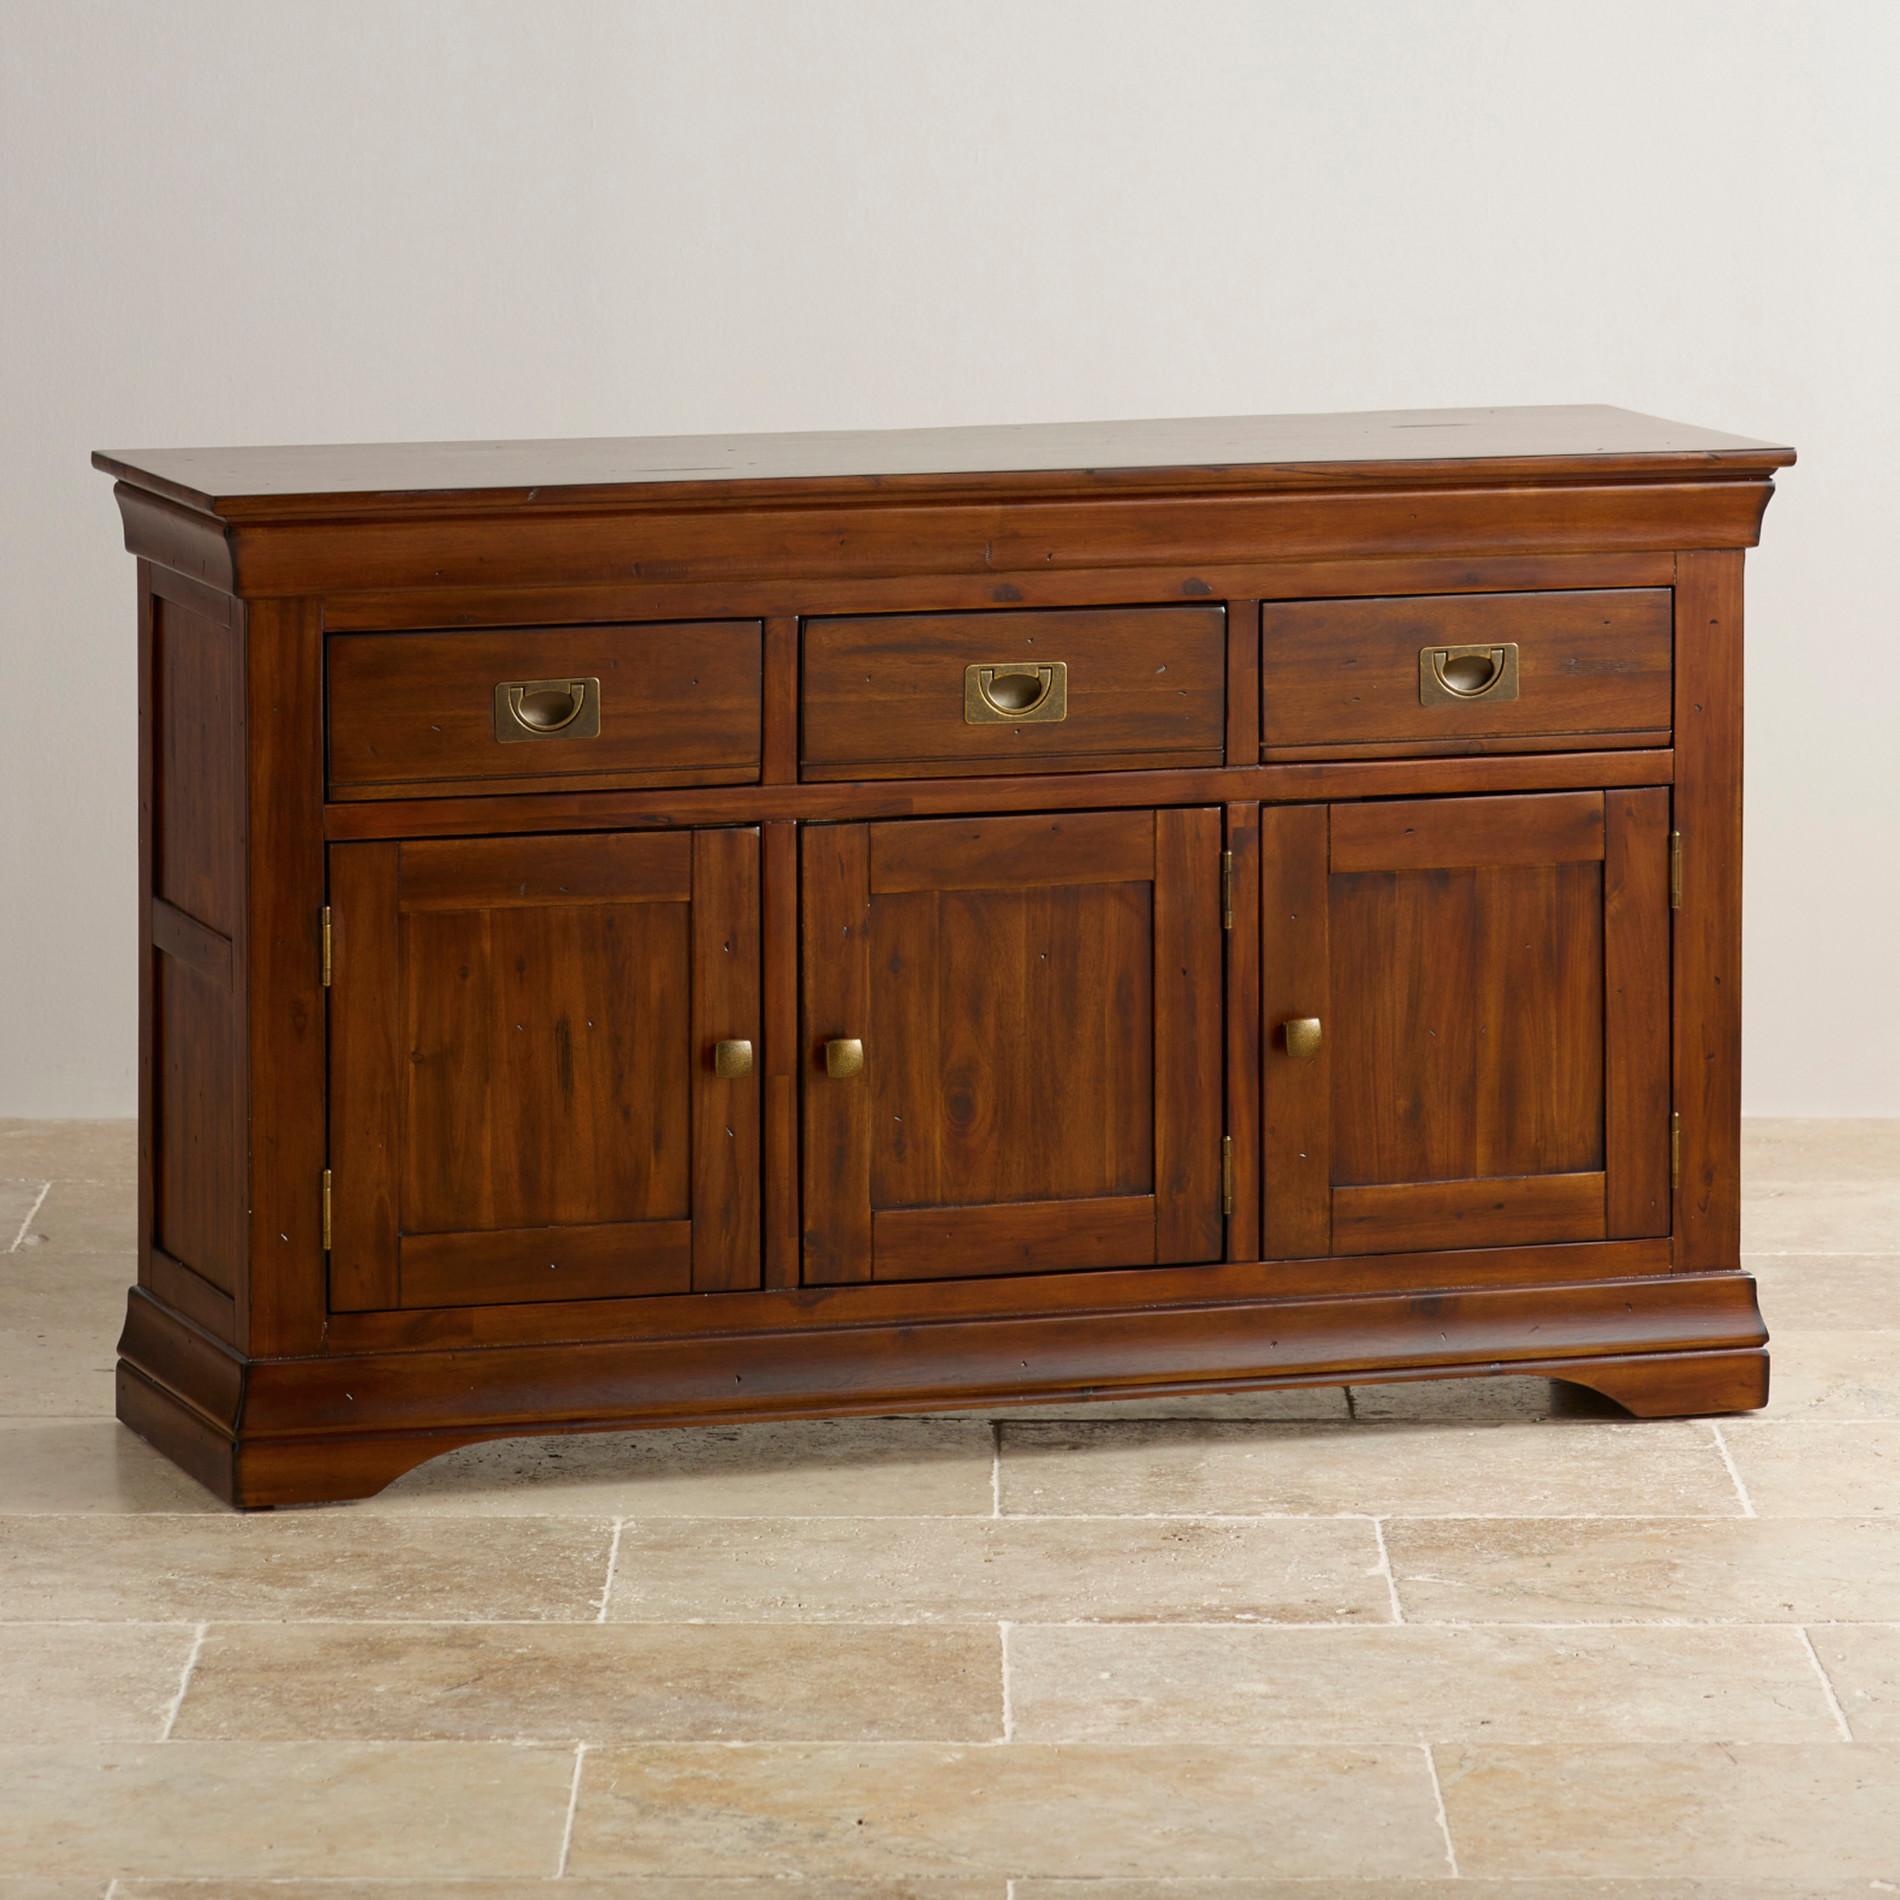 Large Colonial Style Sideboard 100 Acacia Hardwood